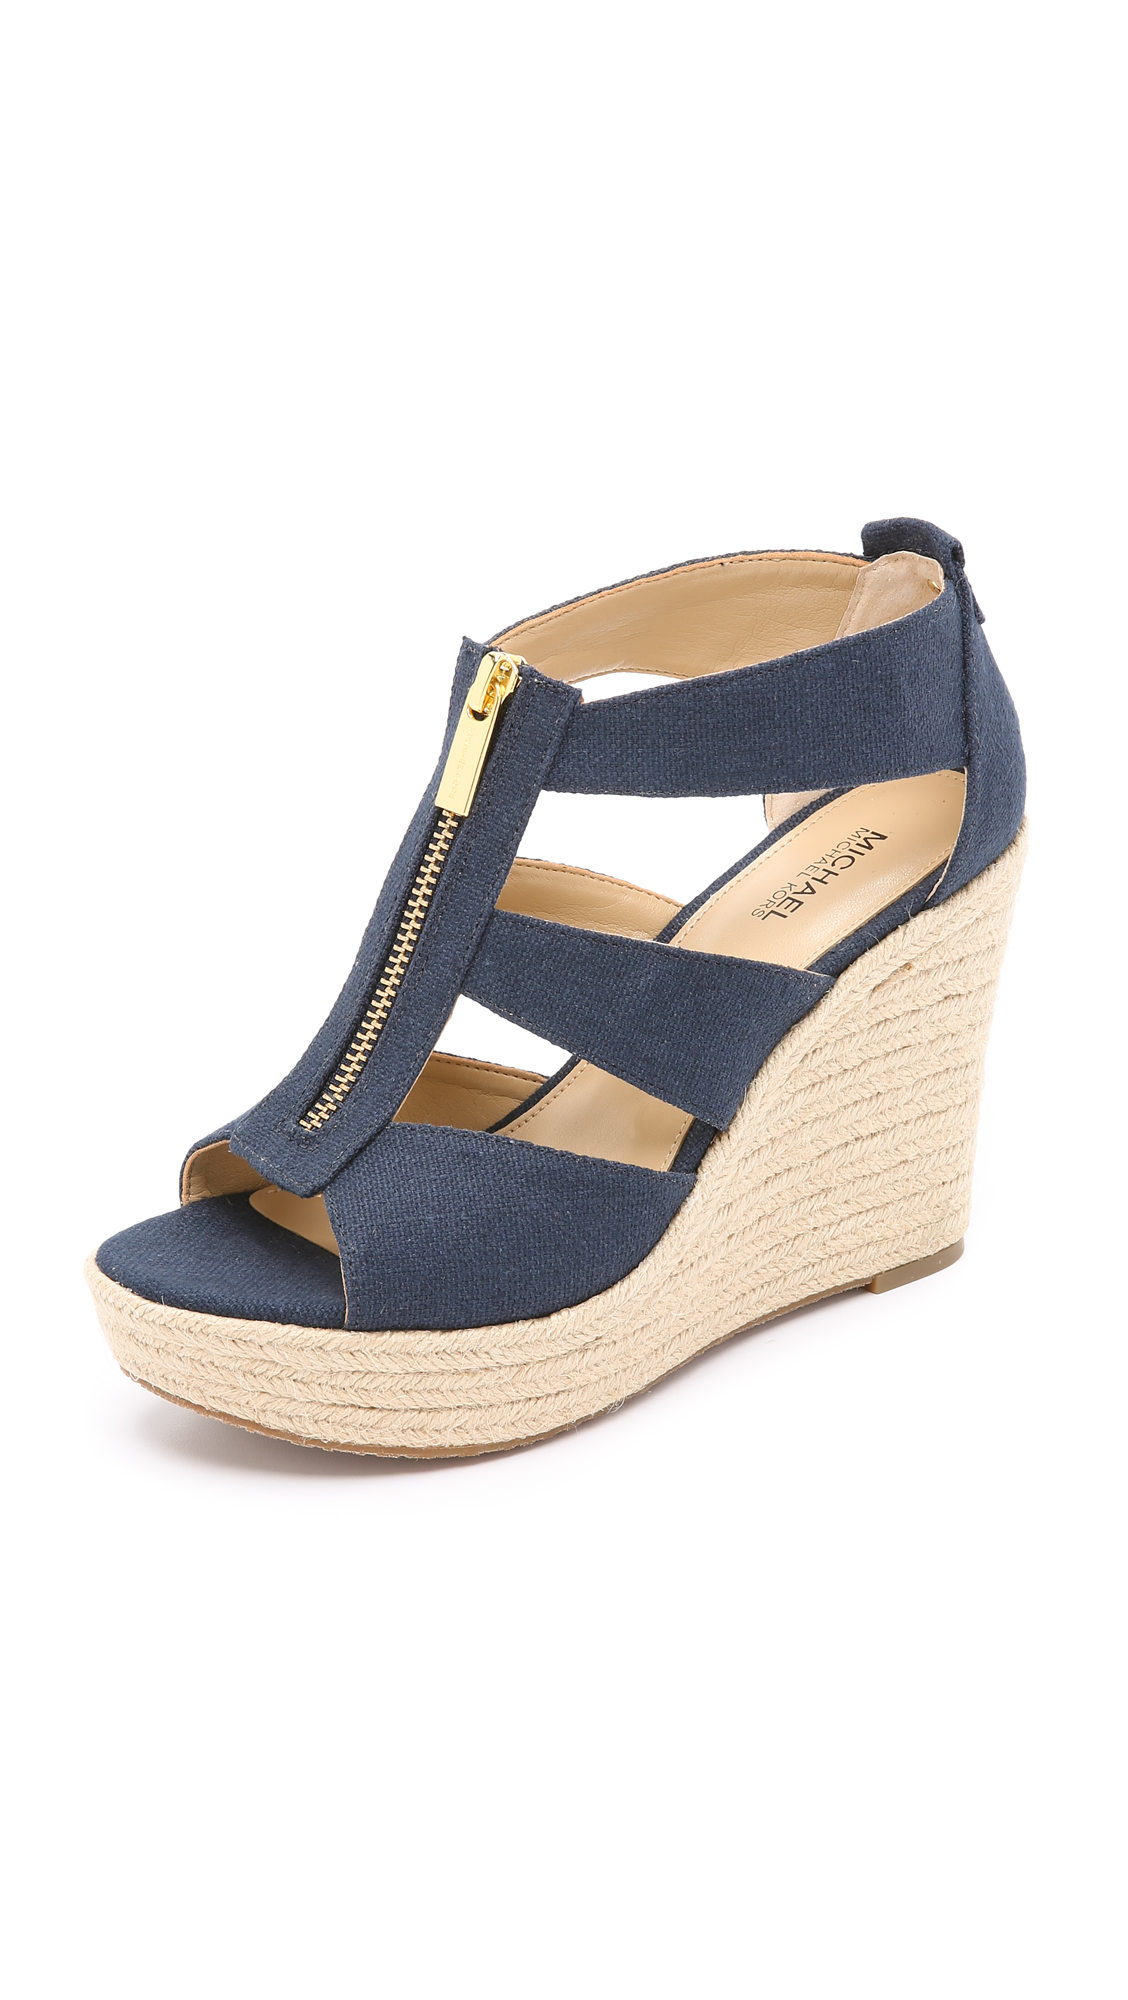 308a5000b7fd MICHAEL Michael Kors Damita Wedge Sandals